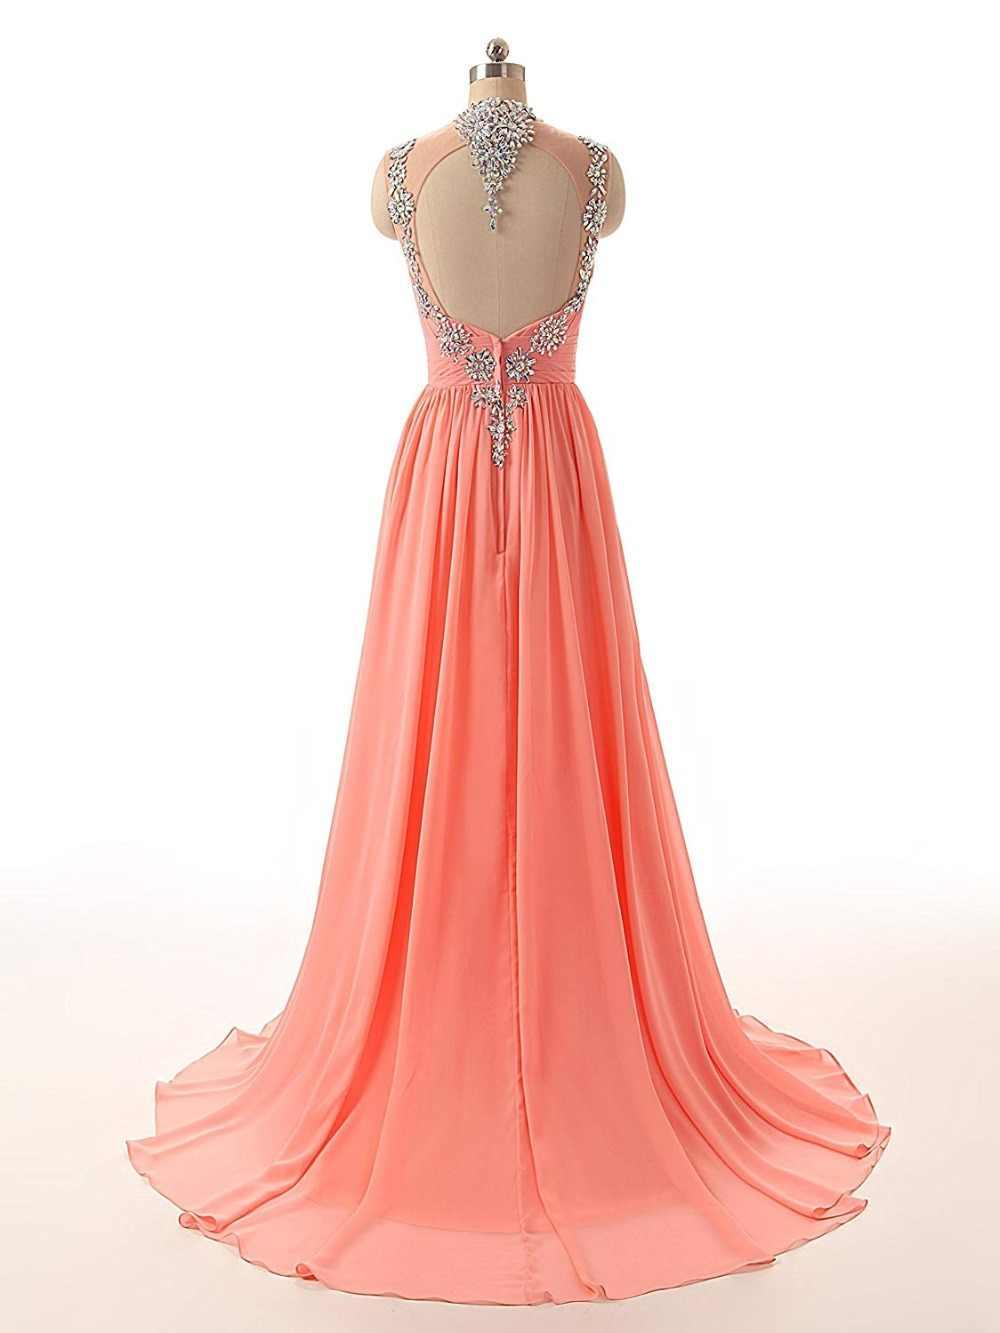 JaneVini נוצץ קריסטל נצנצים שיפון ארוך שושבינה שמלות לנשים קו הלטר ללא משענת לטאטא רכבת Robe מוסלין